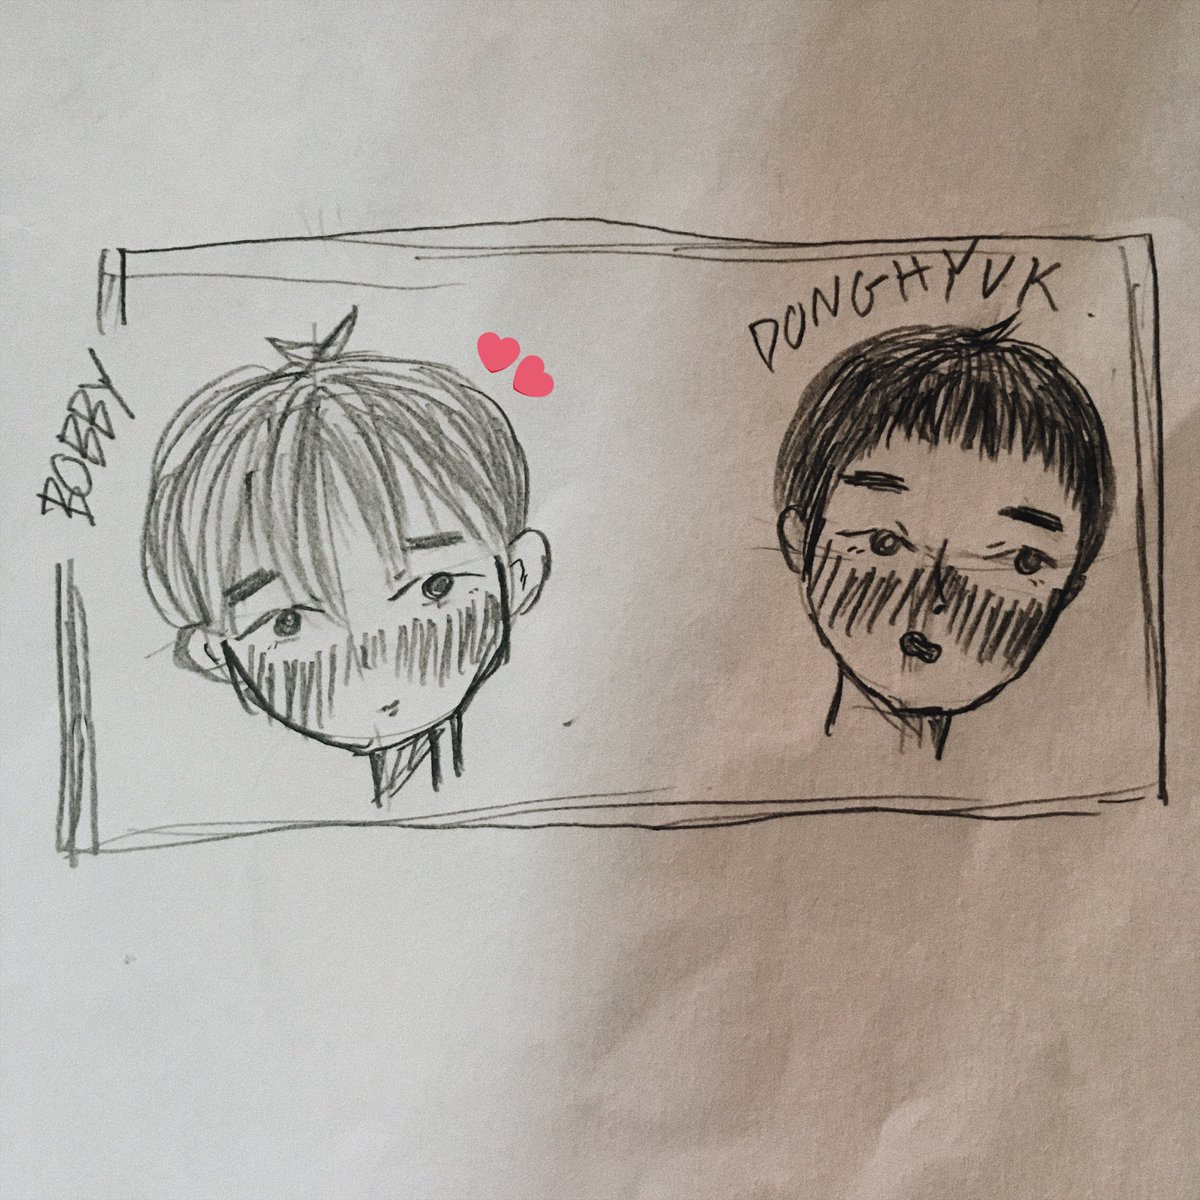 ::first::  bobby x donghyuk   #artbyiindaeyoiisyaa  #fanartikon #iKON<br>http://pic.twitter.com/cVjxm8V0IV